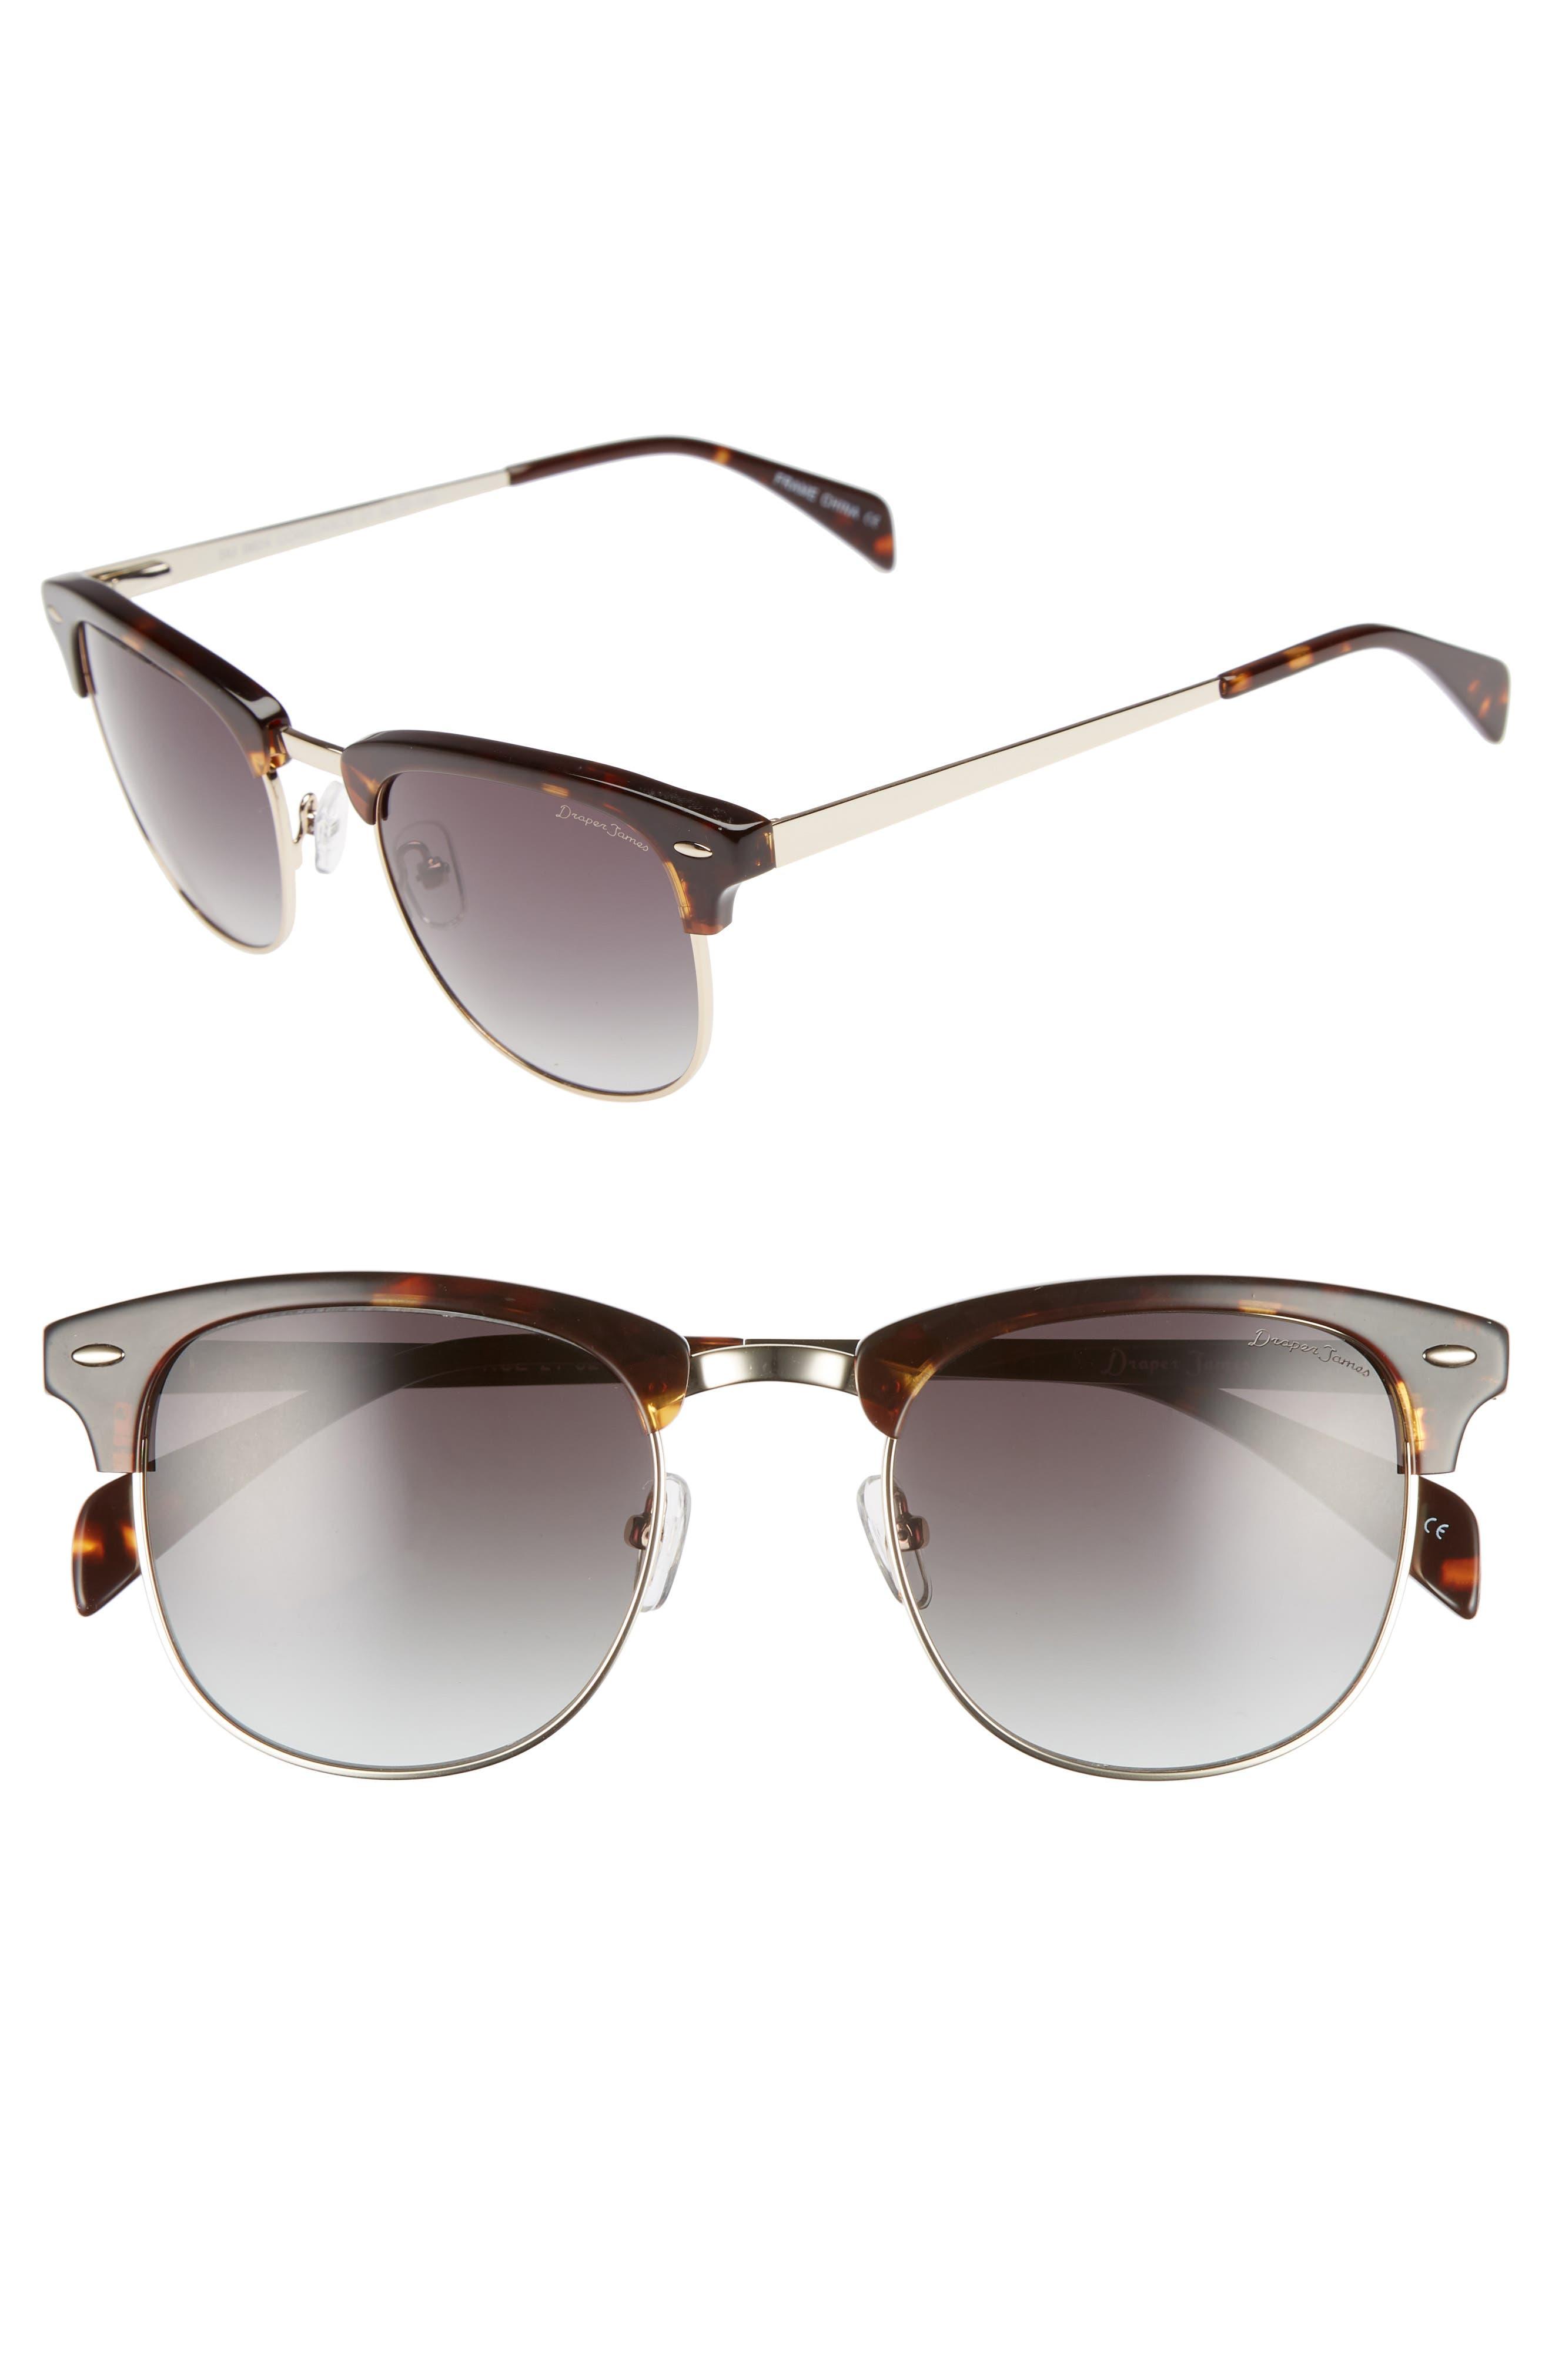 DRAPER JAMES 55Mm Sunglasses - Tortoise